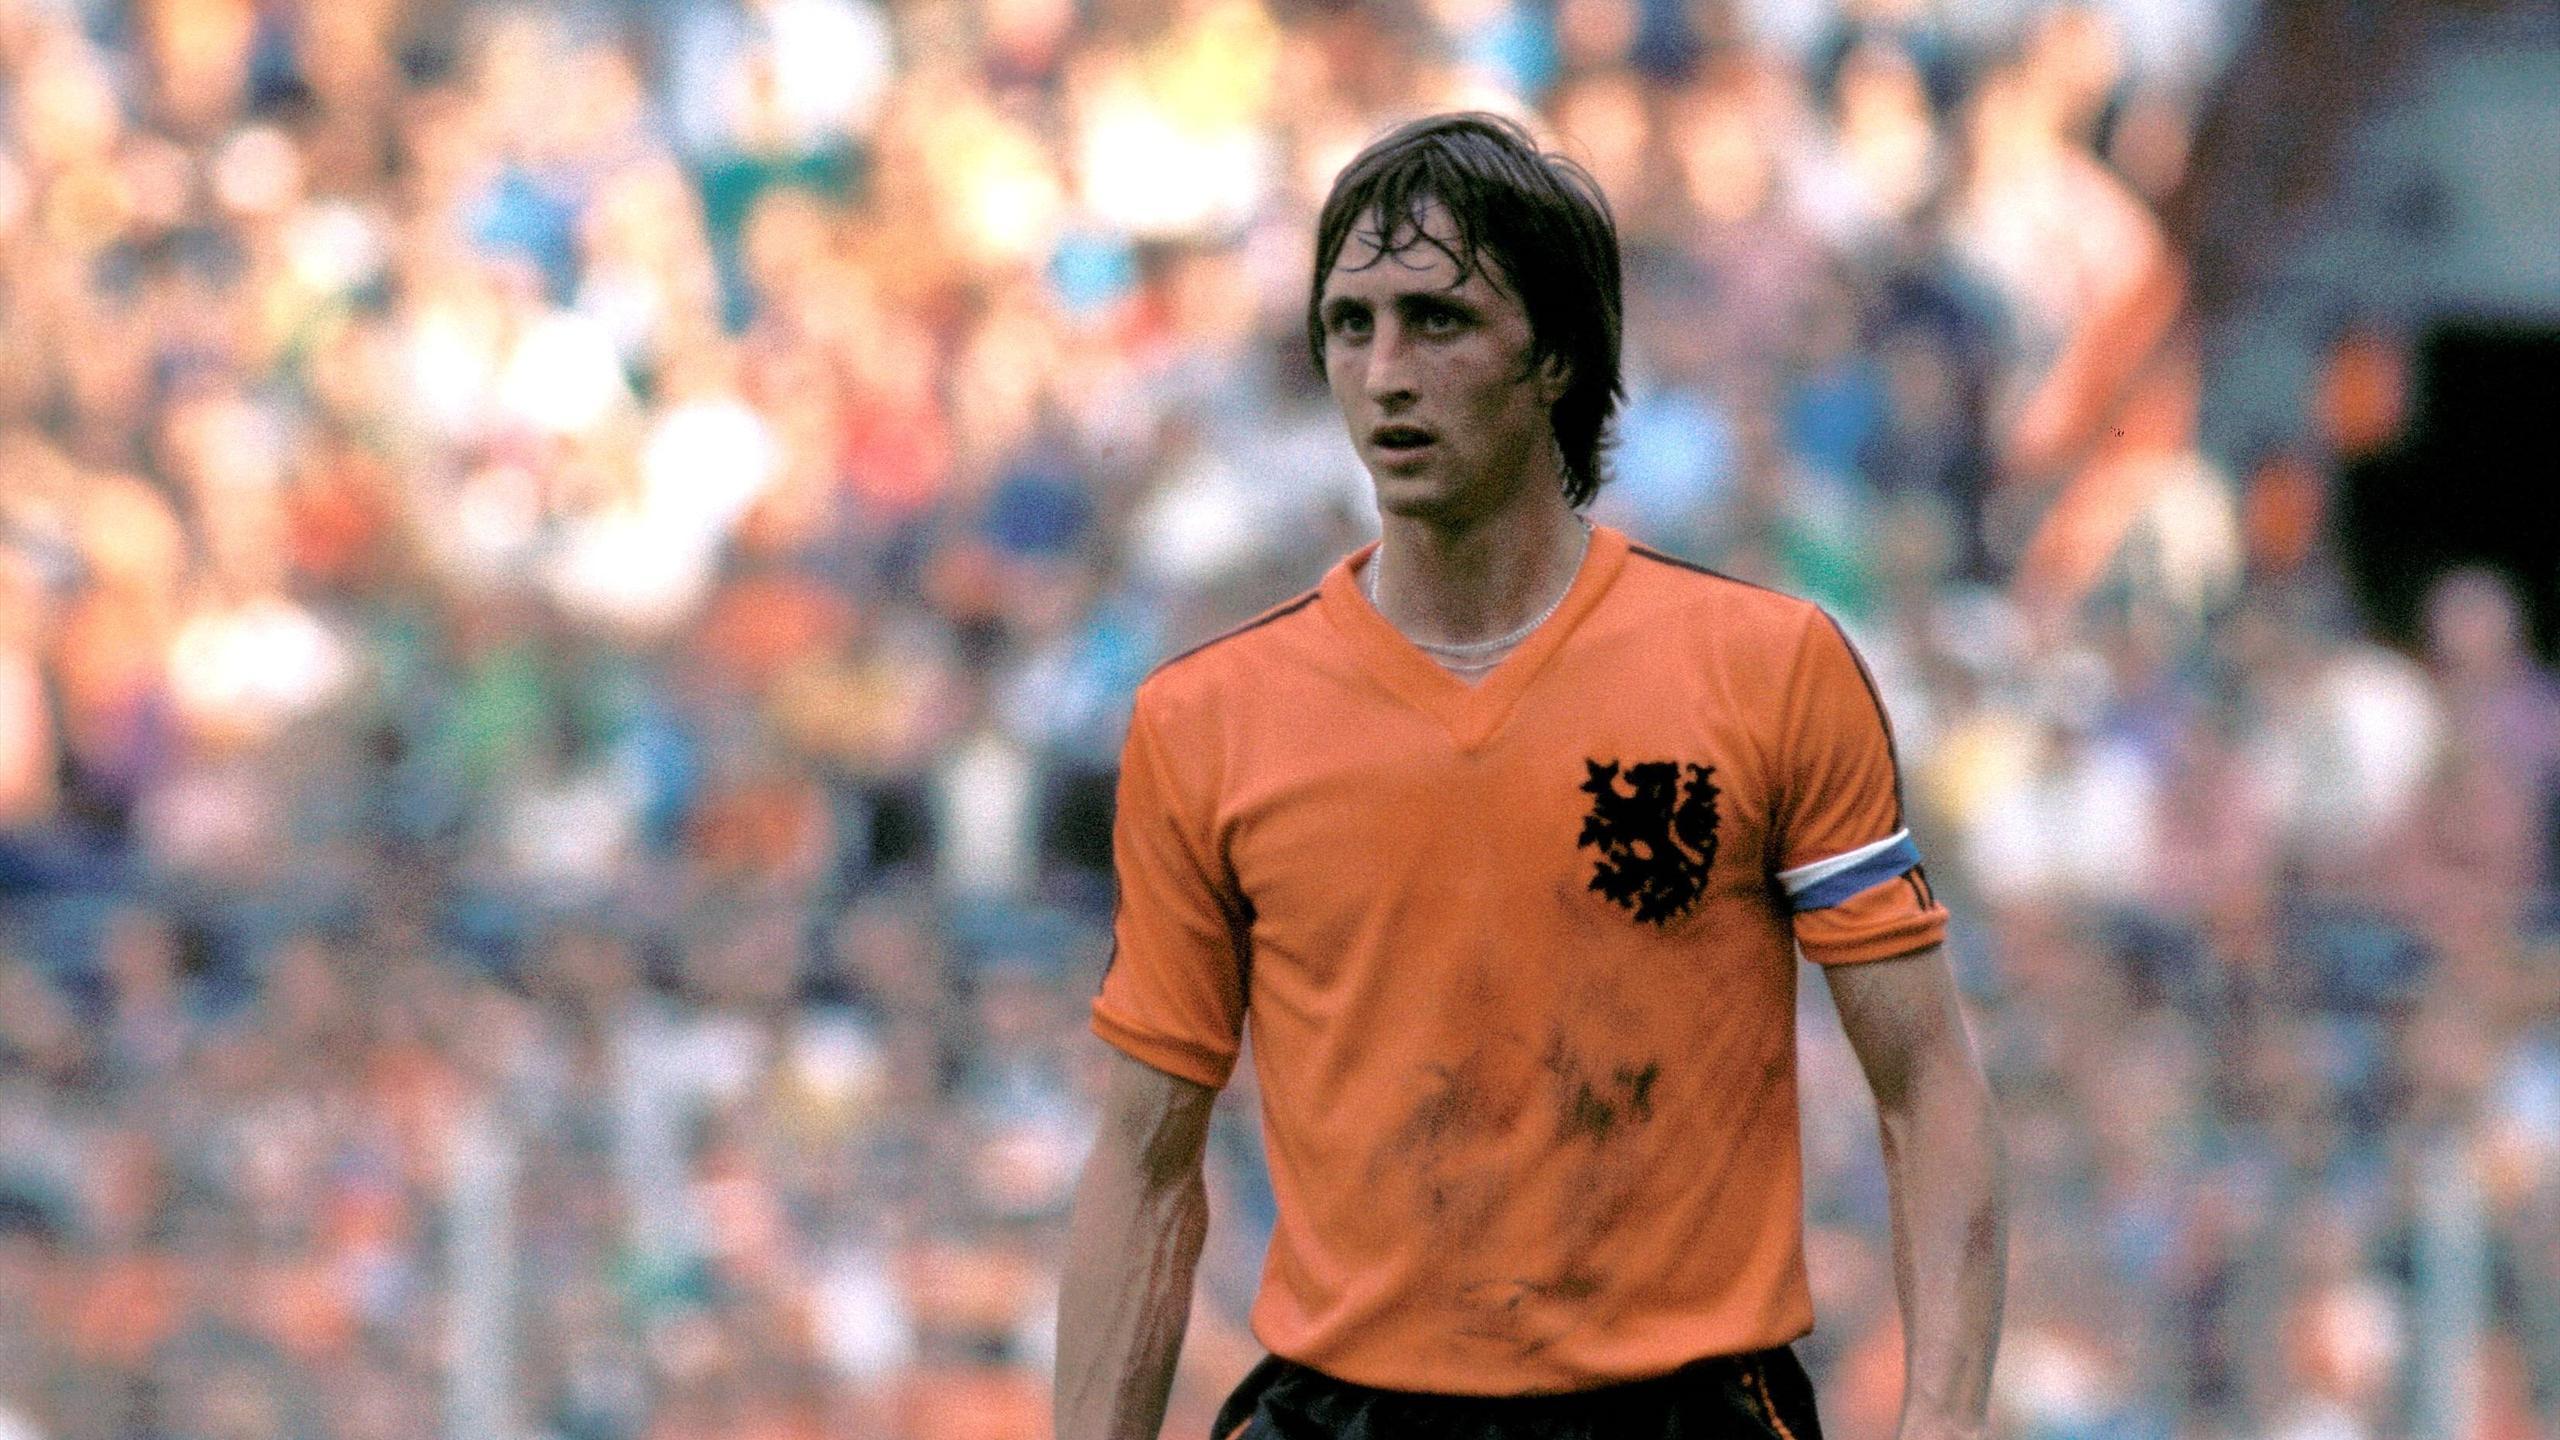 Johan Cruyff est mort - Eurosport